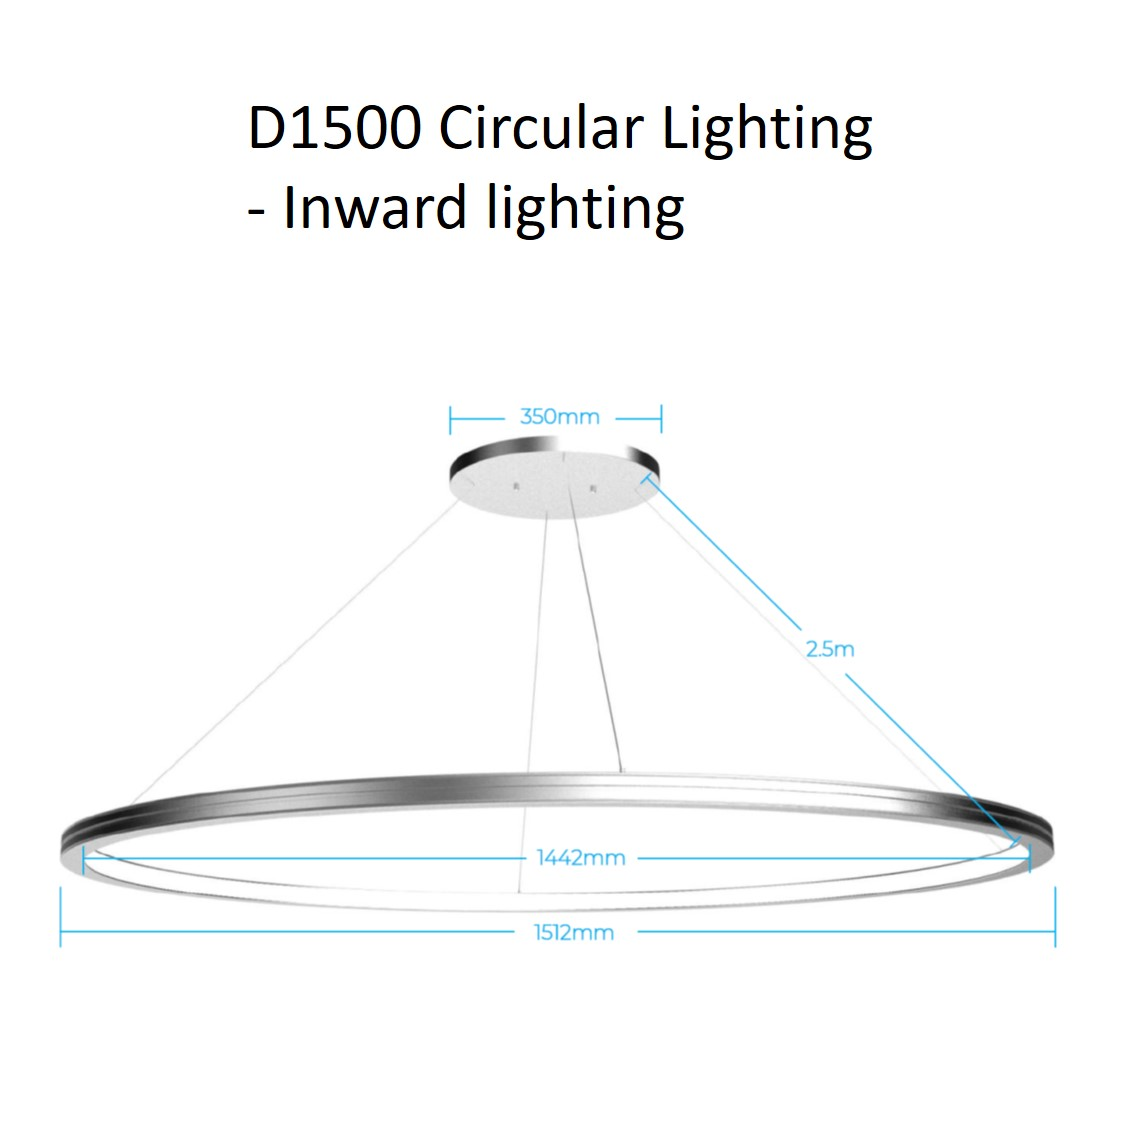 D1500 circular lighting - inward